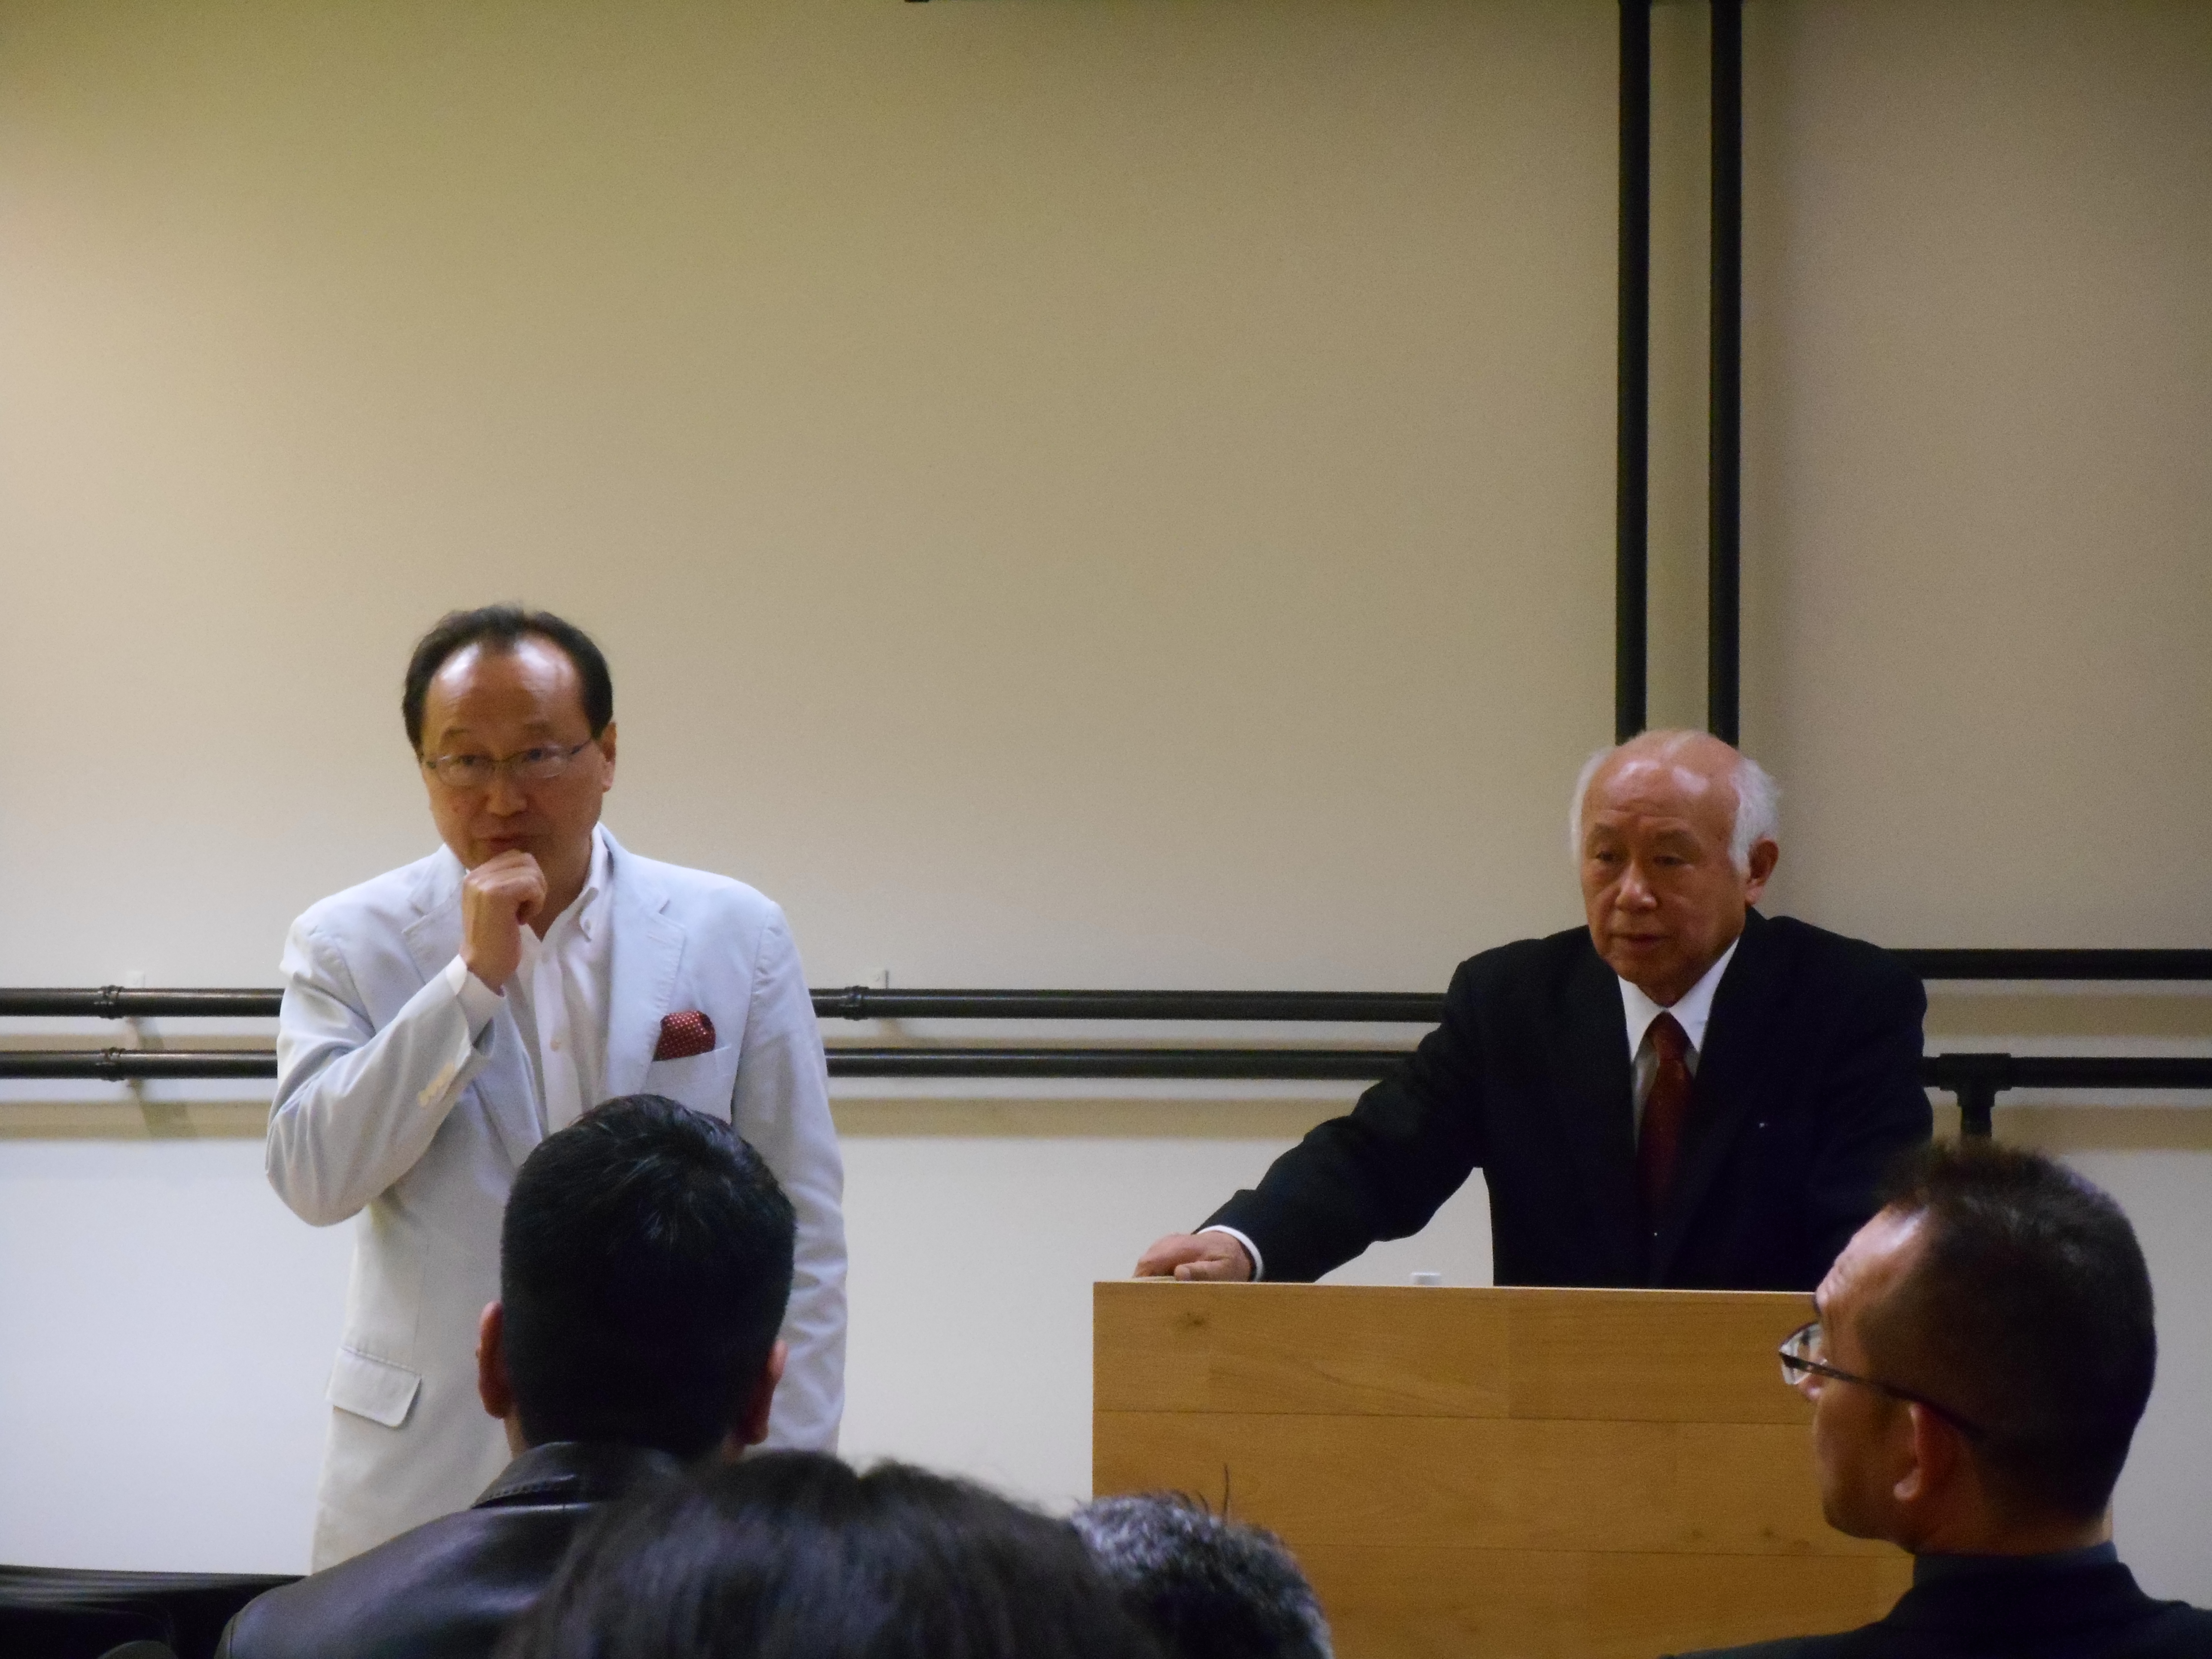 DSCN3729 - 4月1日東京思風塾の開催になります。